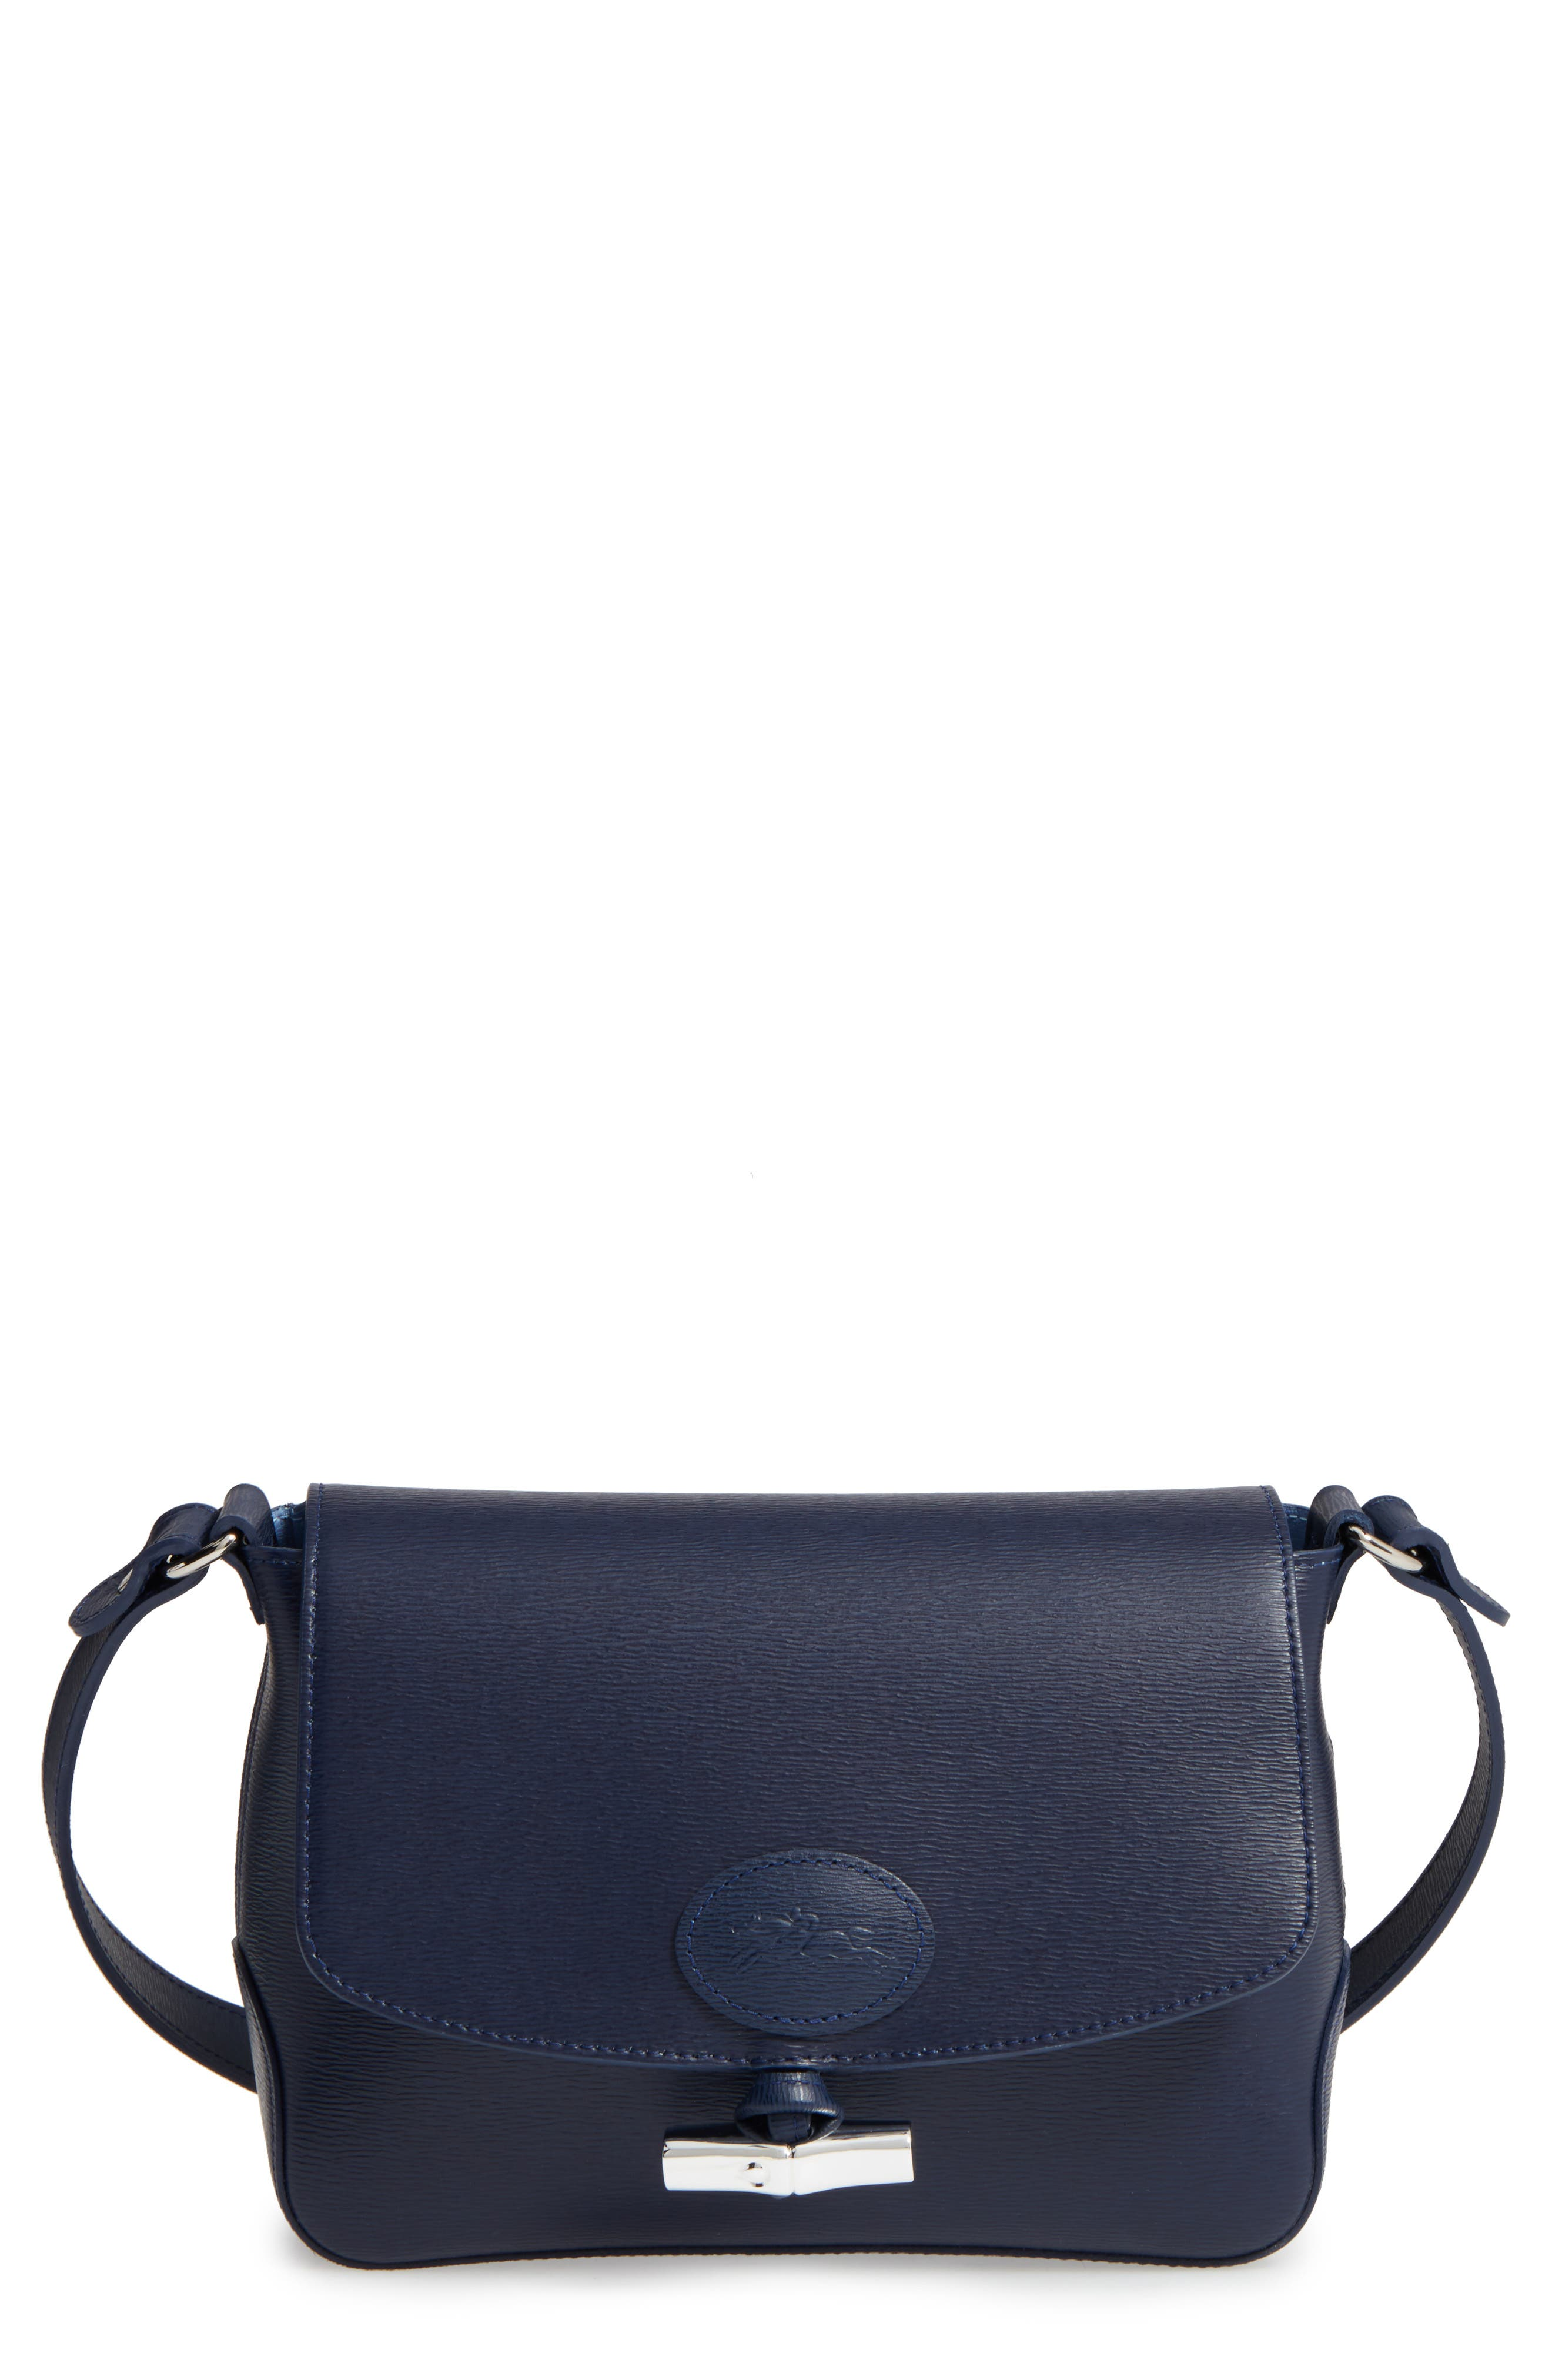 Roseau Leather Crossbody Bag,                             Main thumbnail 1, color,                             Navy